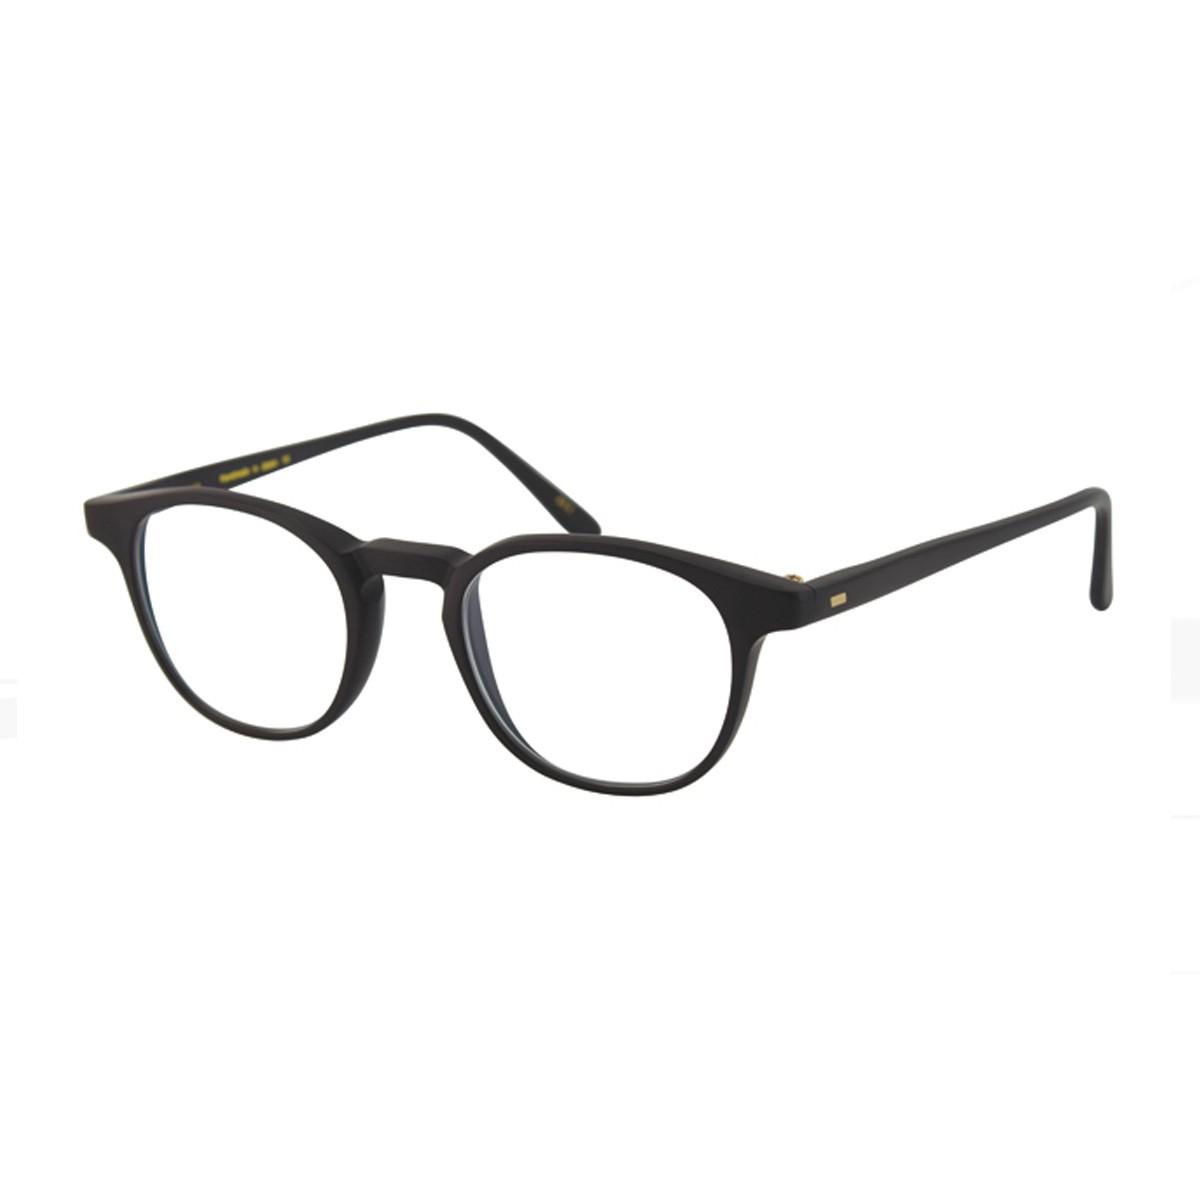 Masunaga GMS-07 | Men's eyeglasses